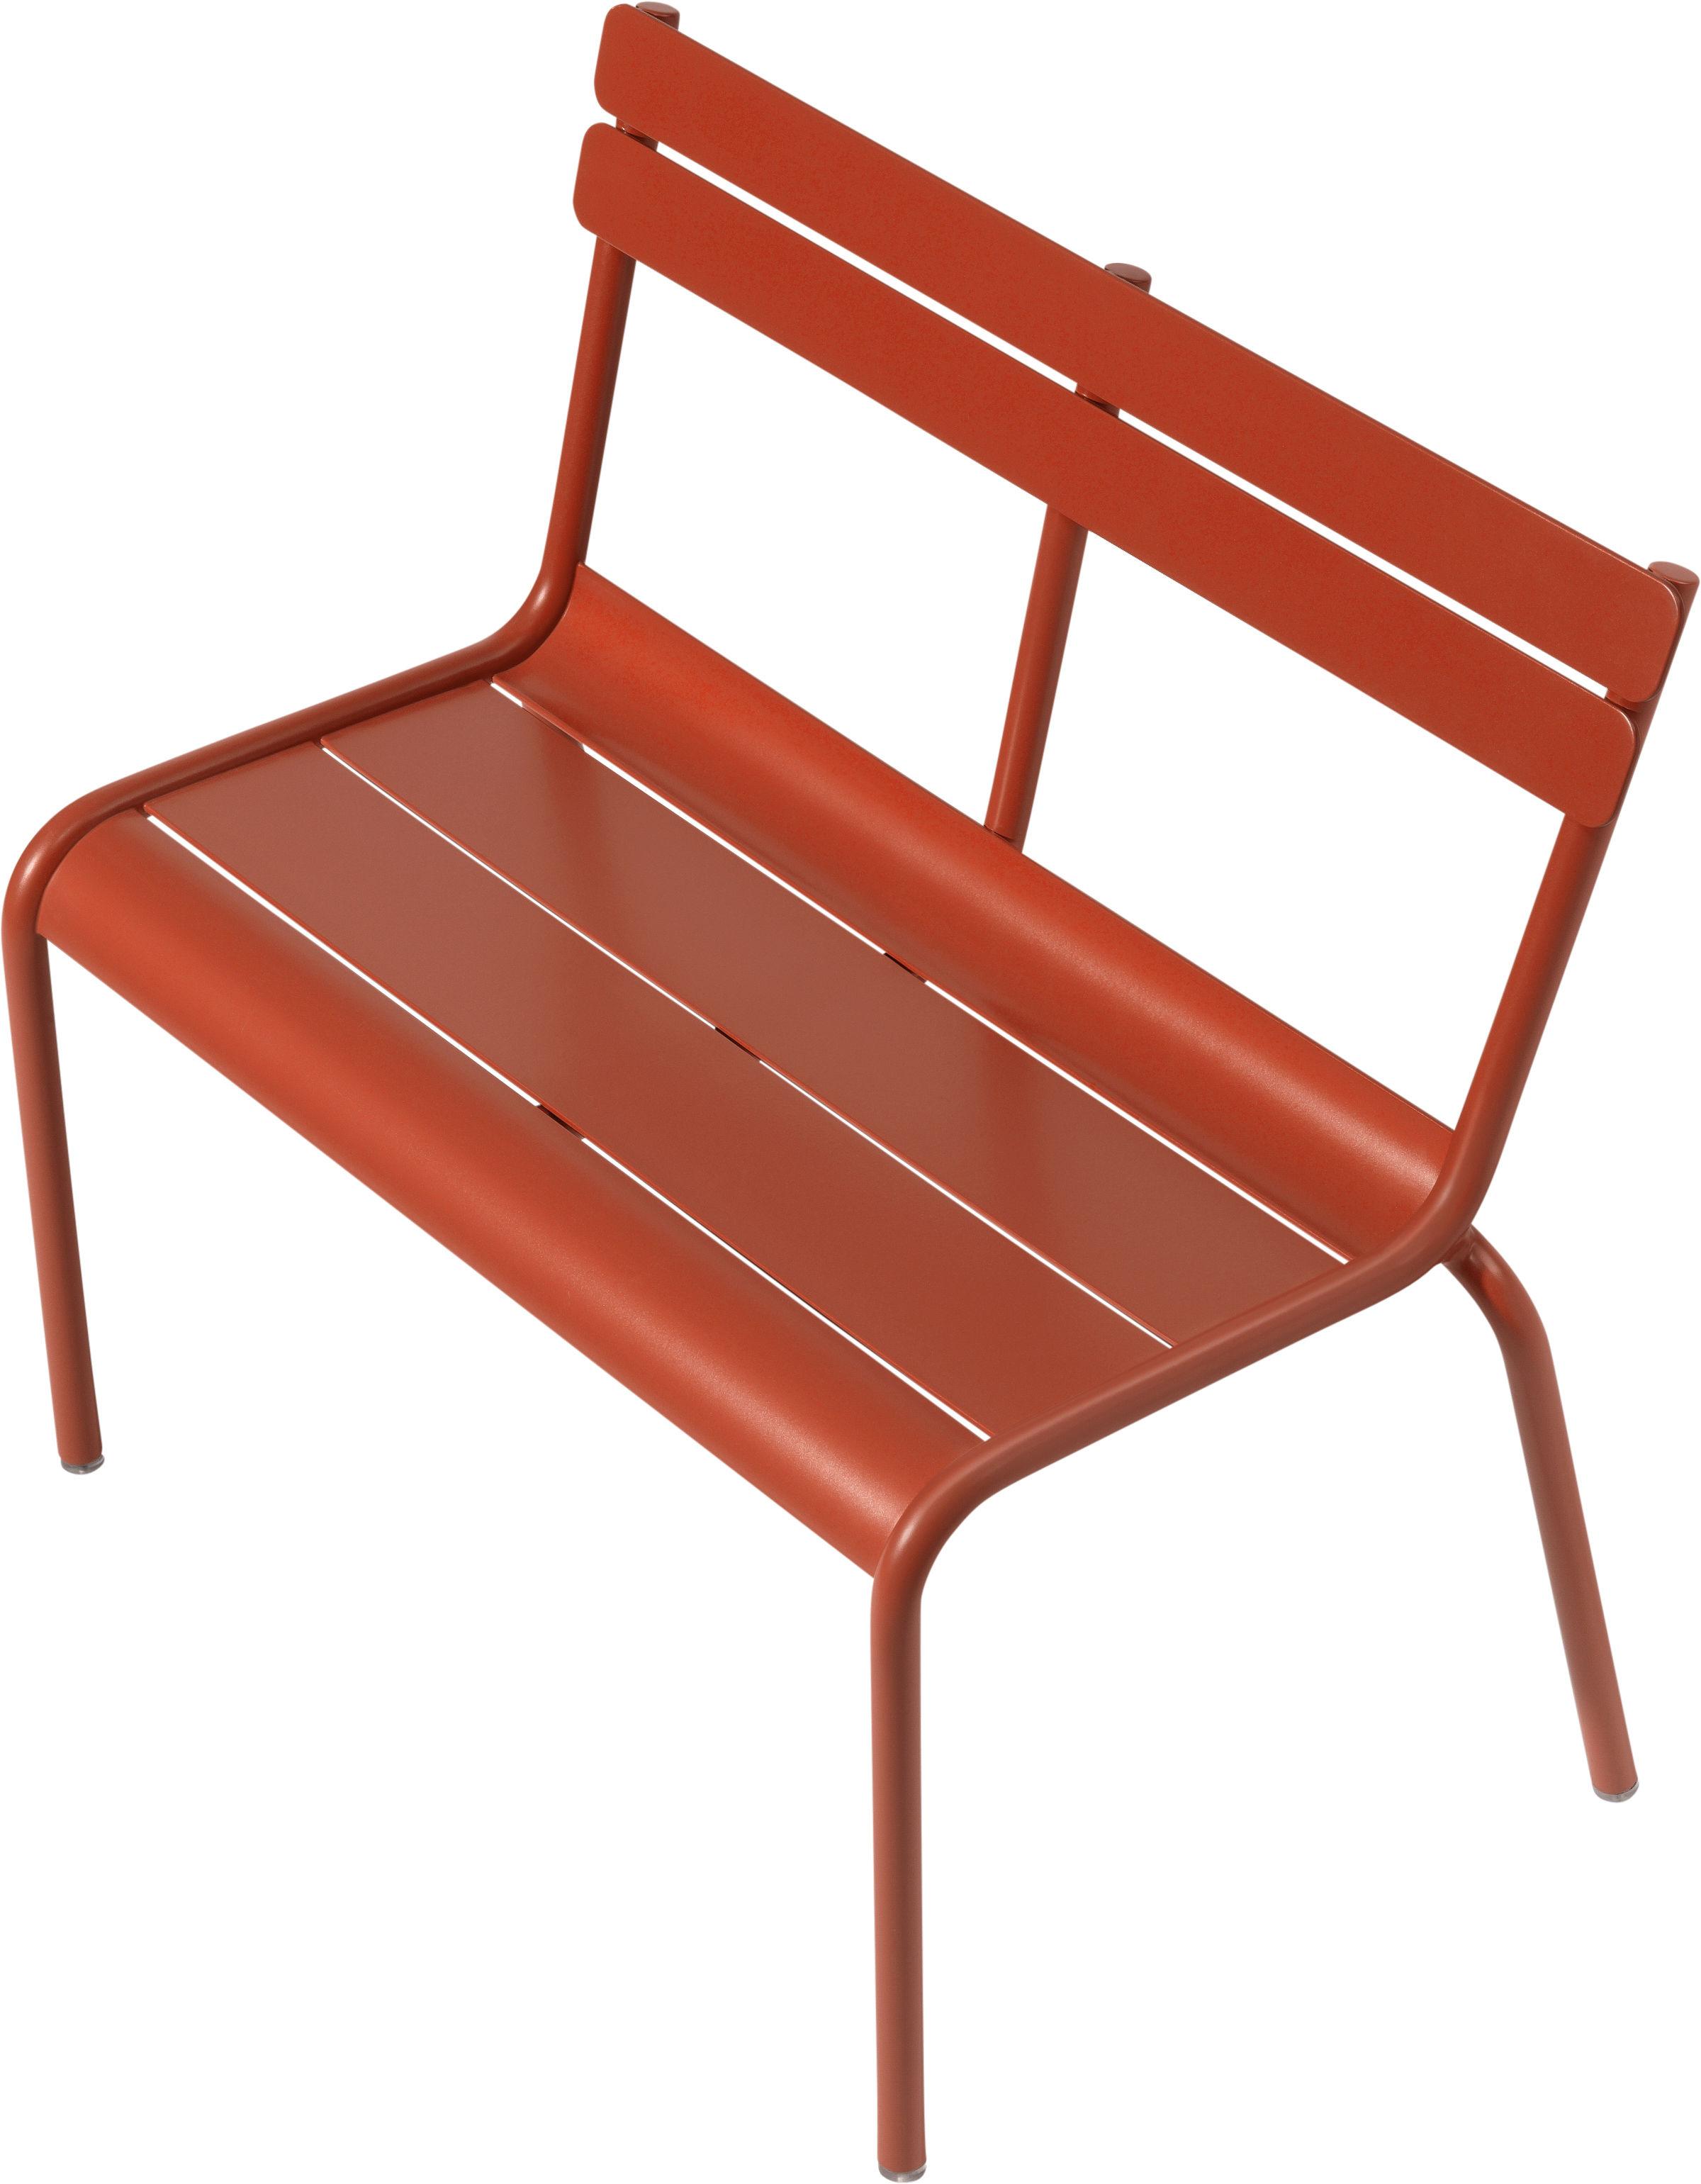 Furniture - Kids Furniture - Luxembourg Kid Children's bench by Fermob - Carott - Aluminium